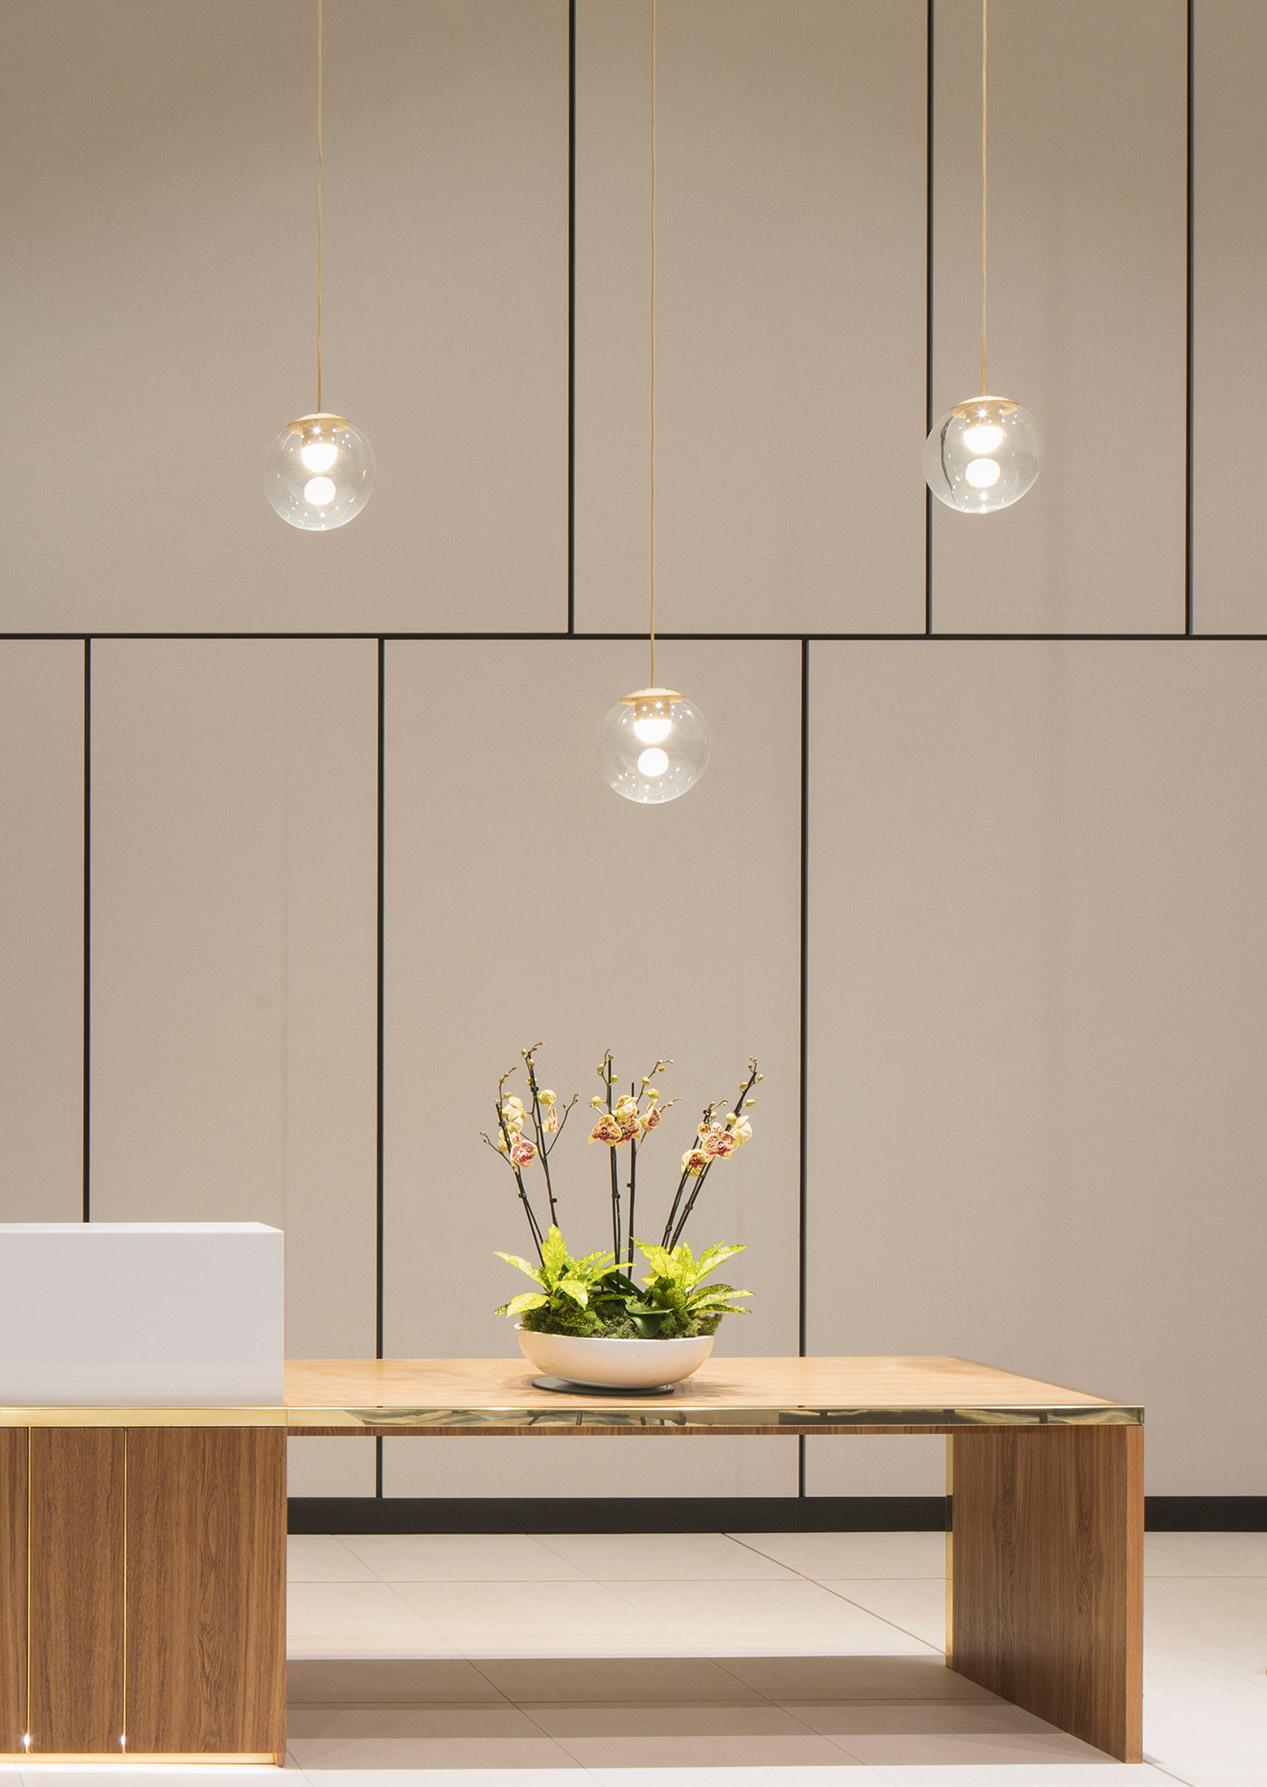 Glass Globe Drop Pendant Lights Minimal Stylish Design Feature Office Reception Desk Designers Nulty Bespoke